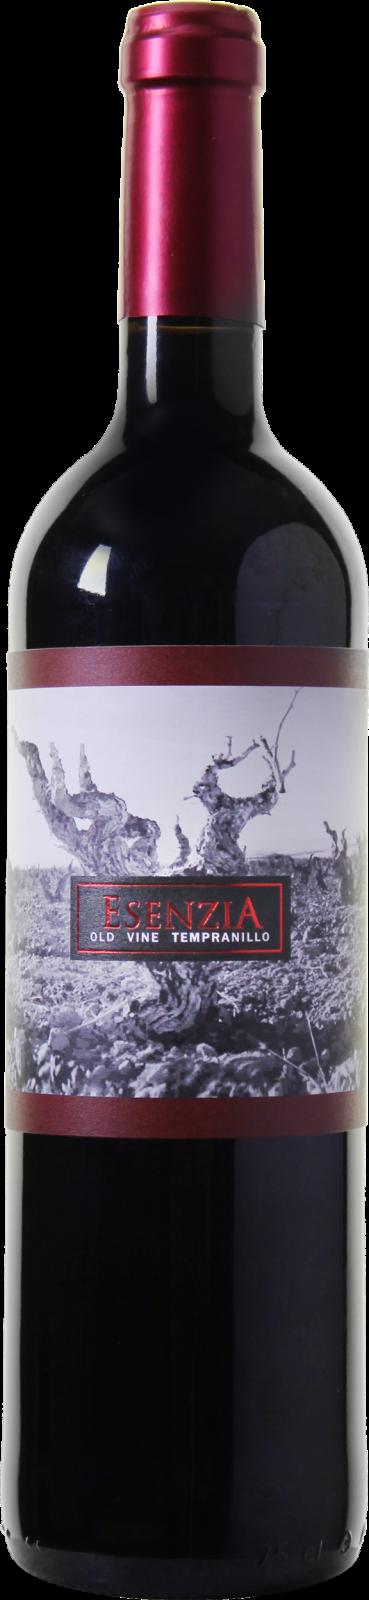 Esenzia Tempranillo wijnbeurs.nl